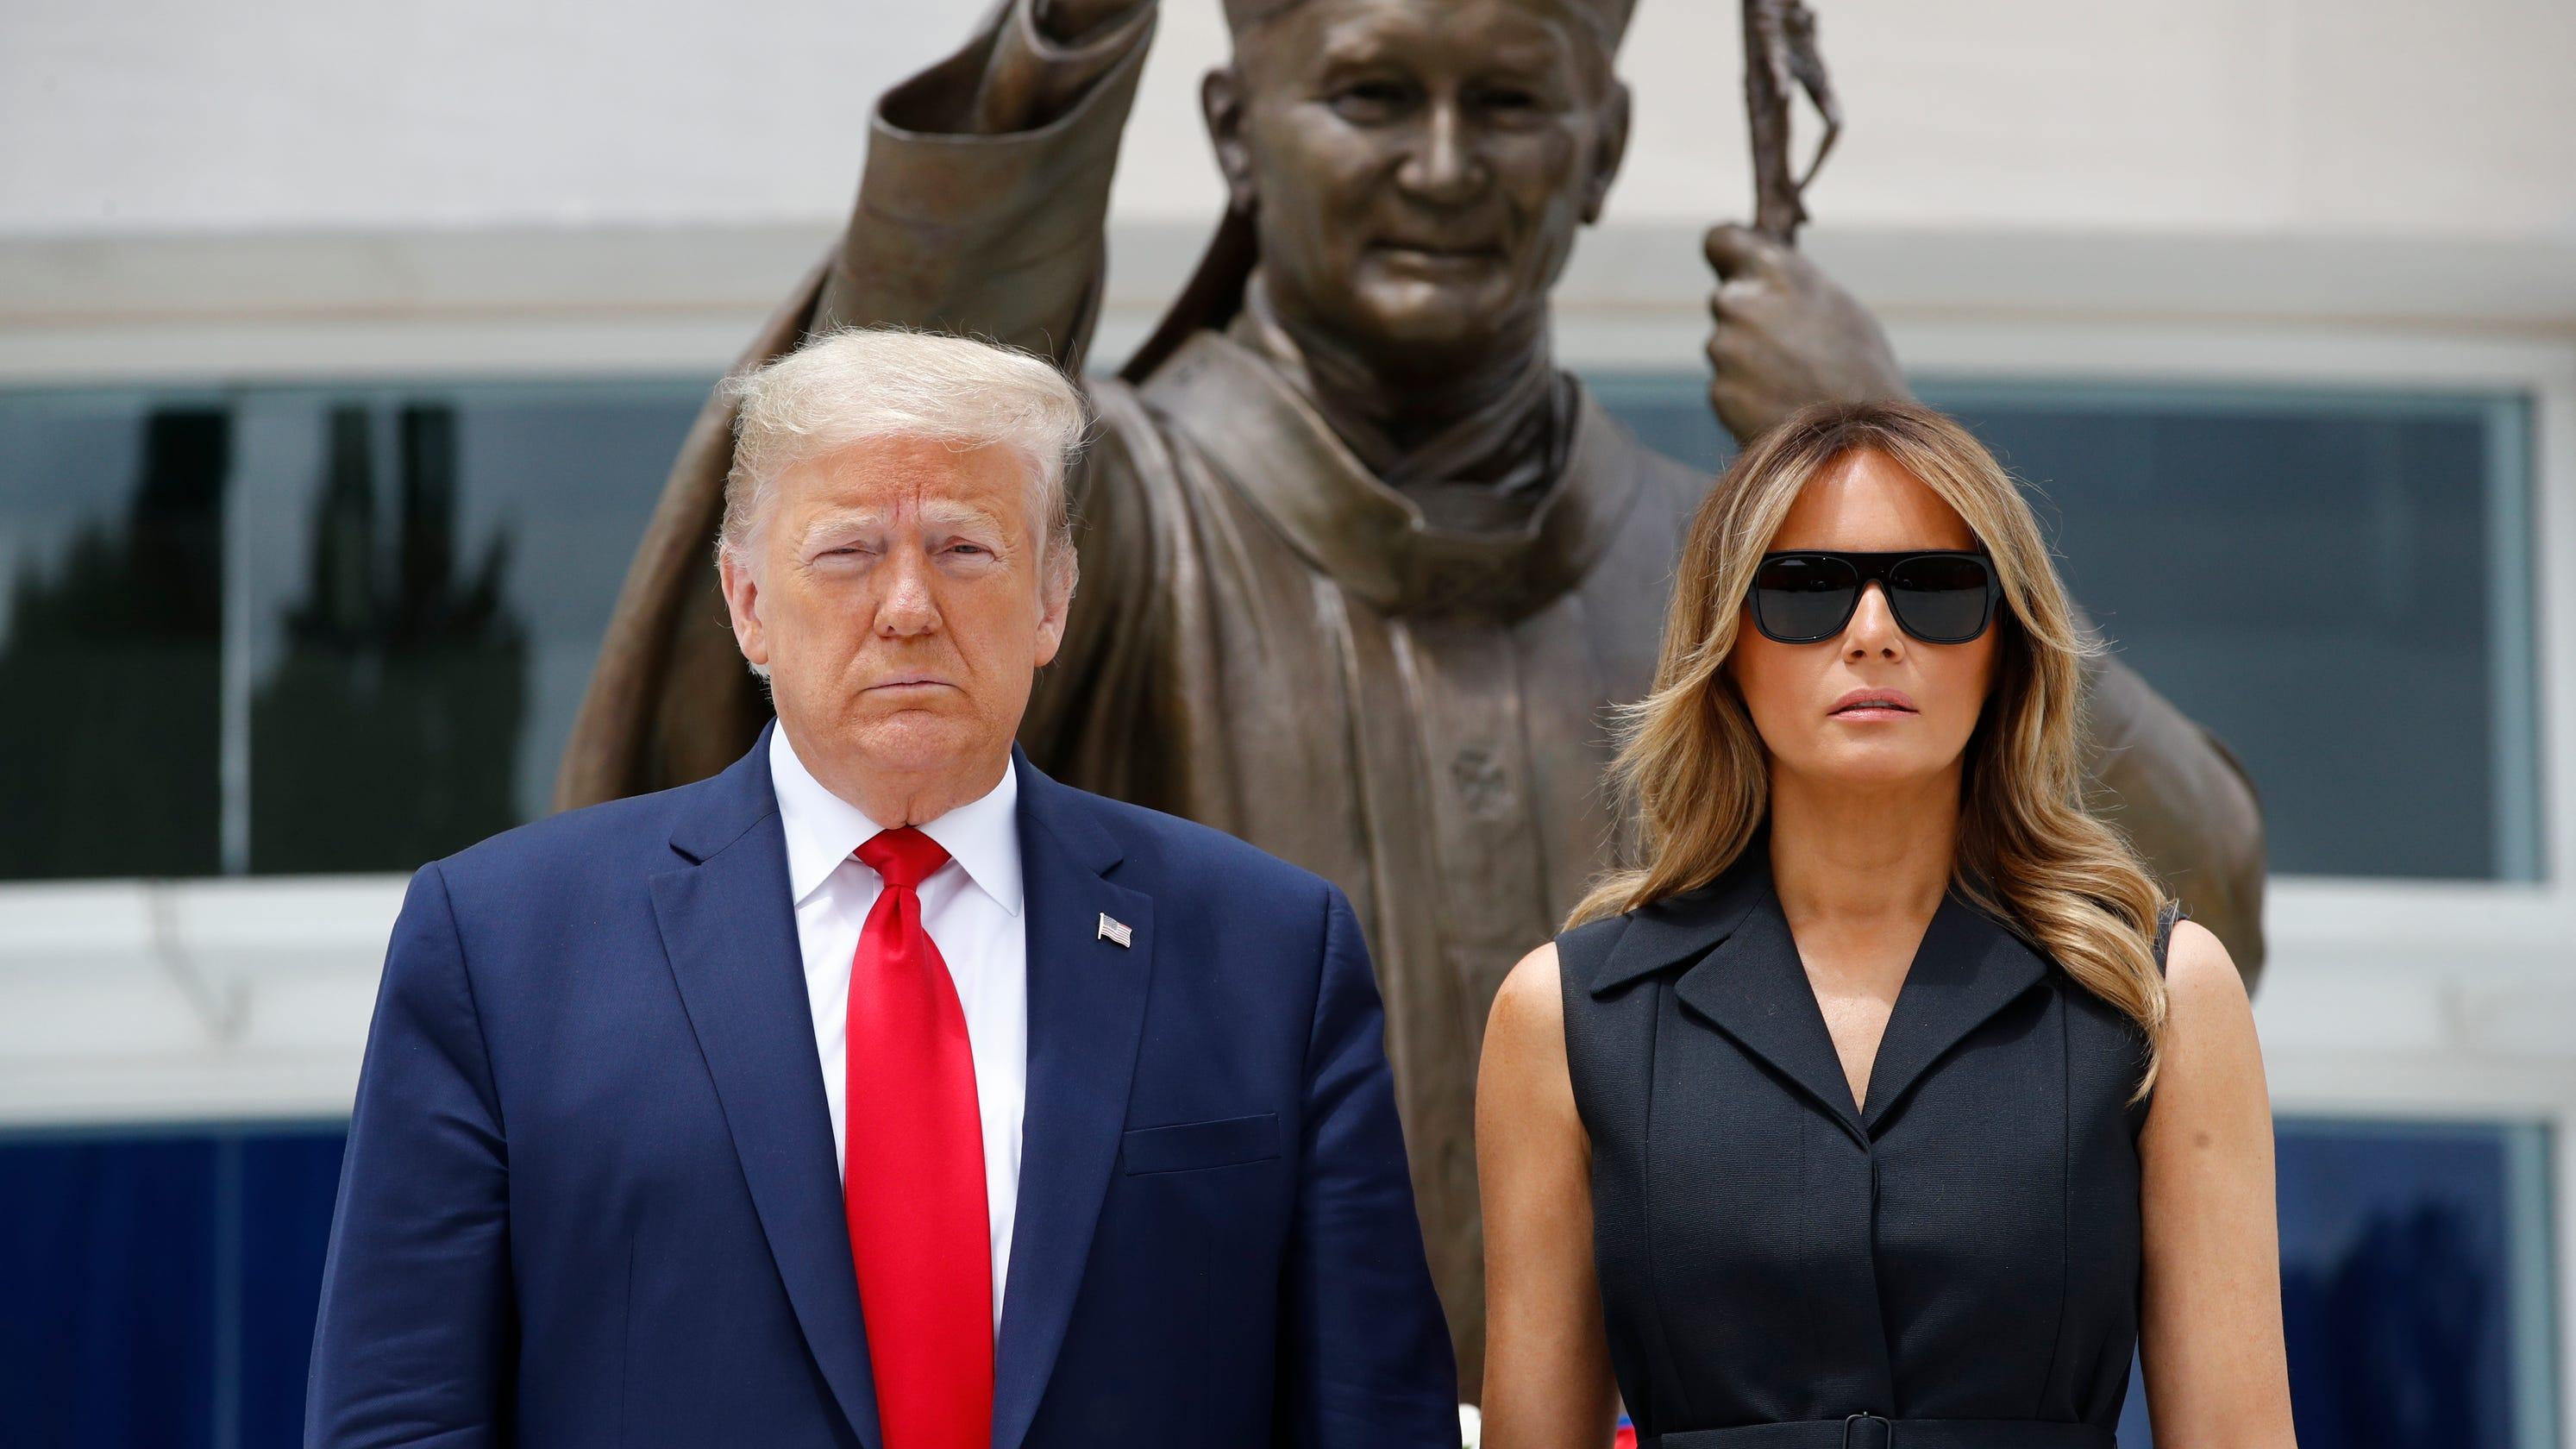 Melania Trump se rebelle : Cette vidéo embarrassante pour Donald Trump